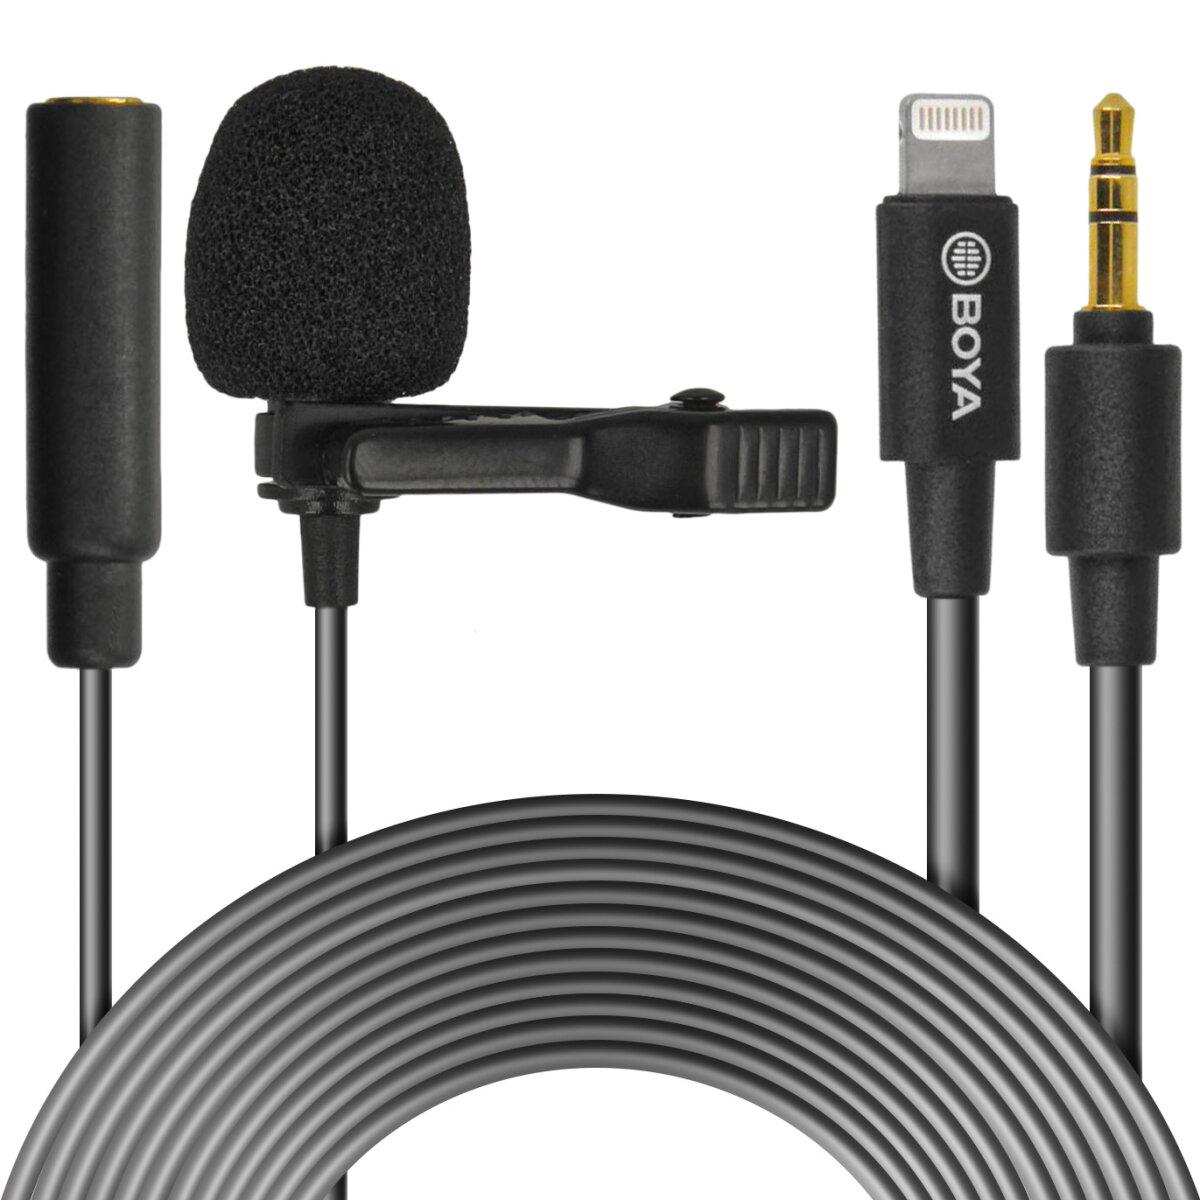 BOYA Lightning lapel mic for iPhone - BY-M2